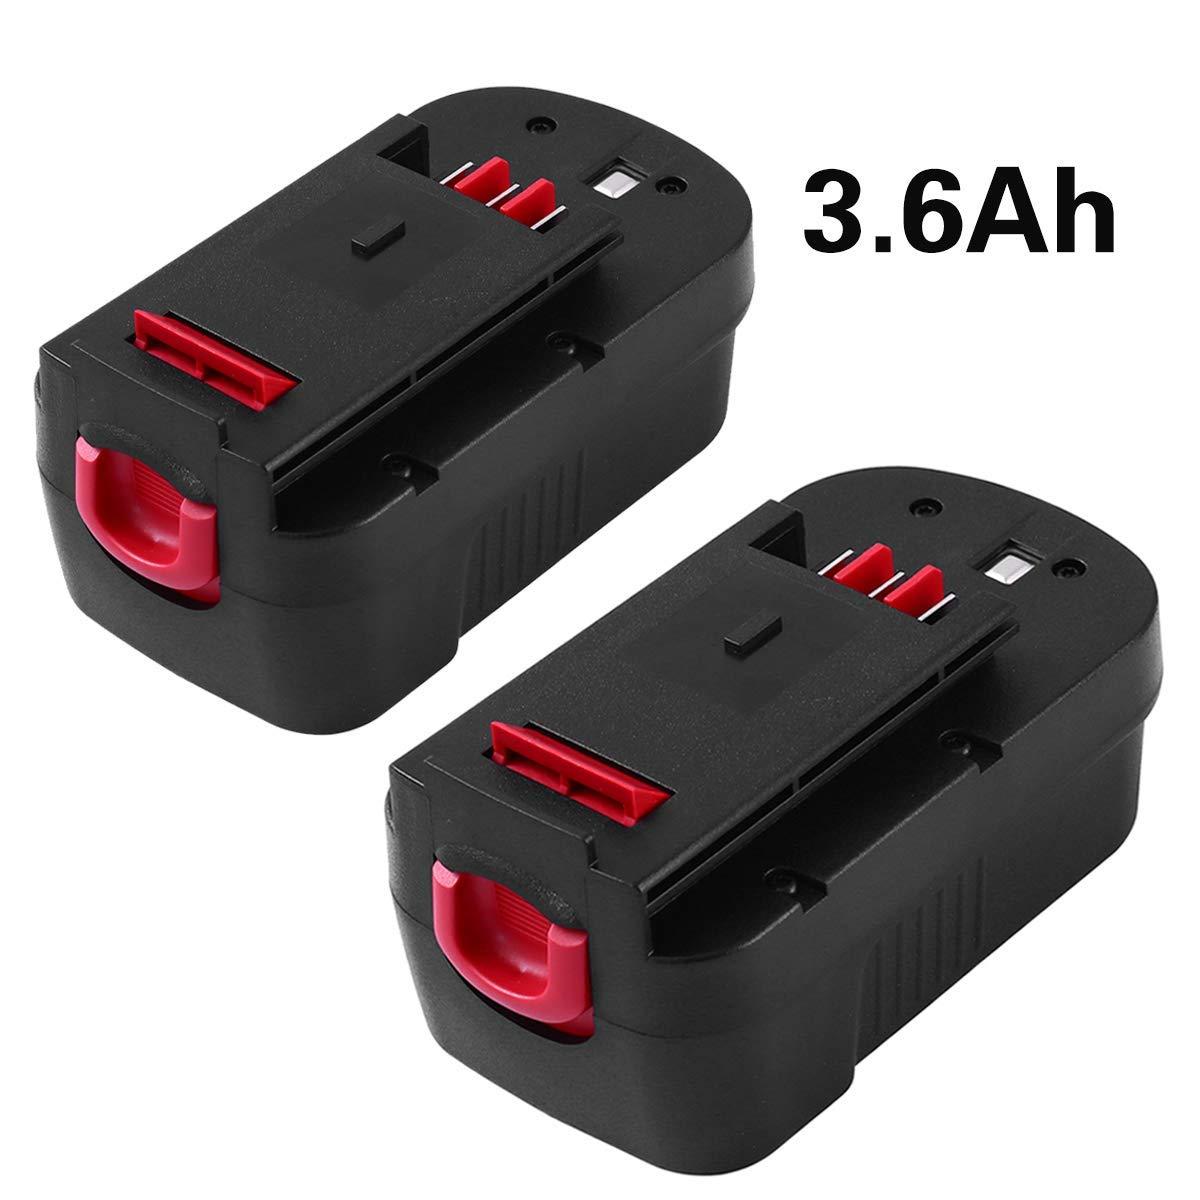 Replace for Black and Decker 18 Volt Battery HPB18 3.6Ah 18v Ni-Cd HPB18-OPE 244760-00 A1718 FEB180S A18 A18E A18NH FS18FL FS180BX FS18BX FSB18 Firestorm Cordless Power Tools